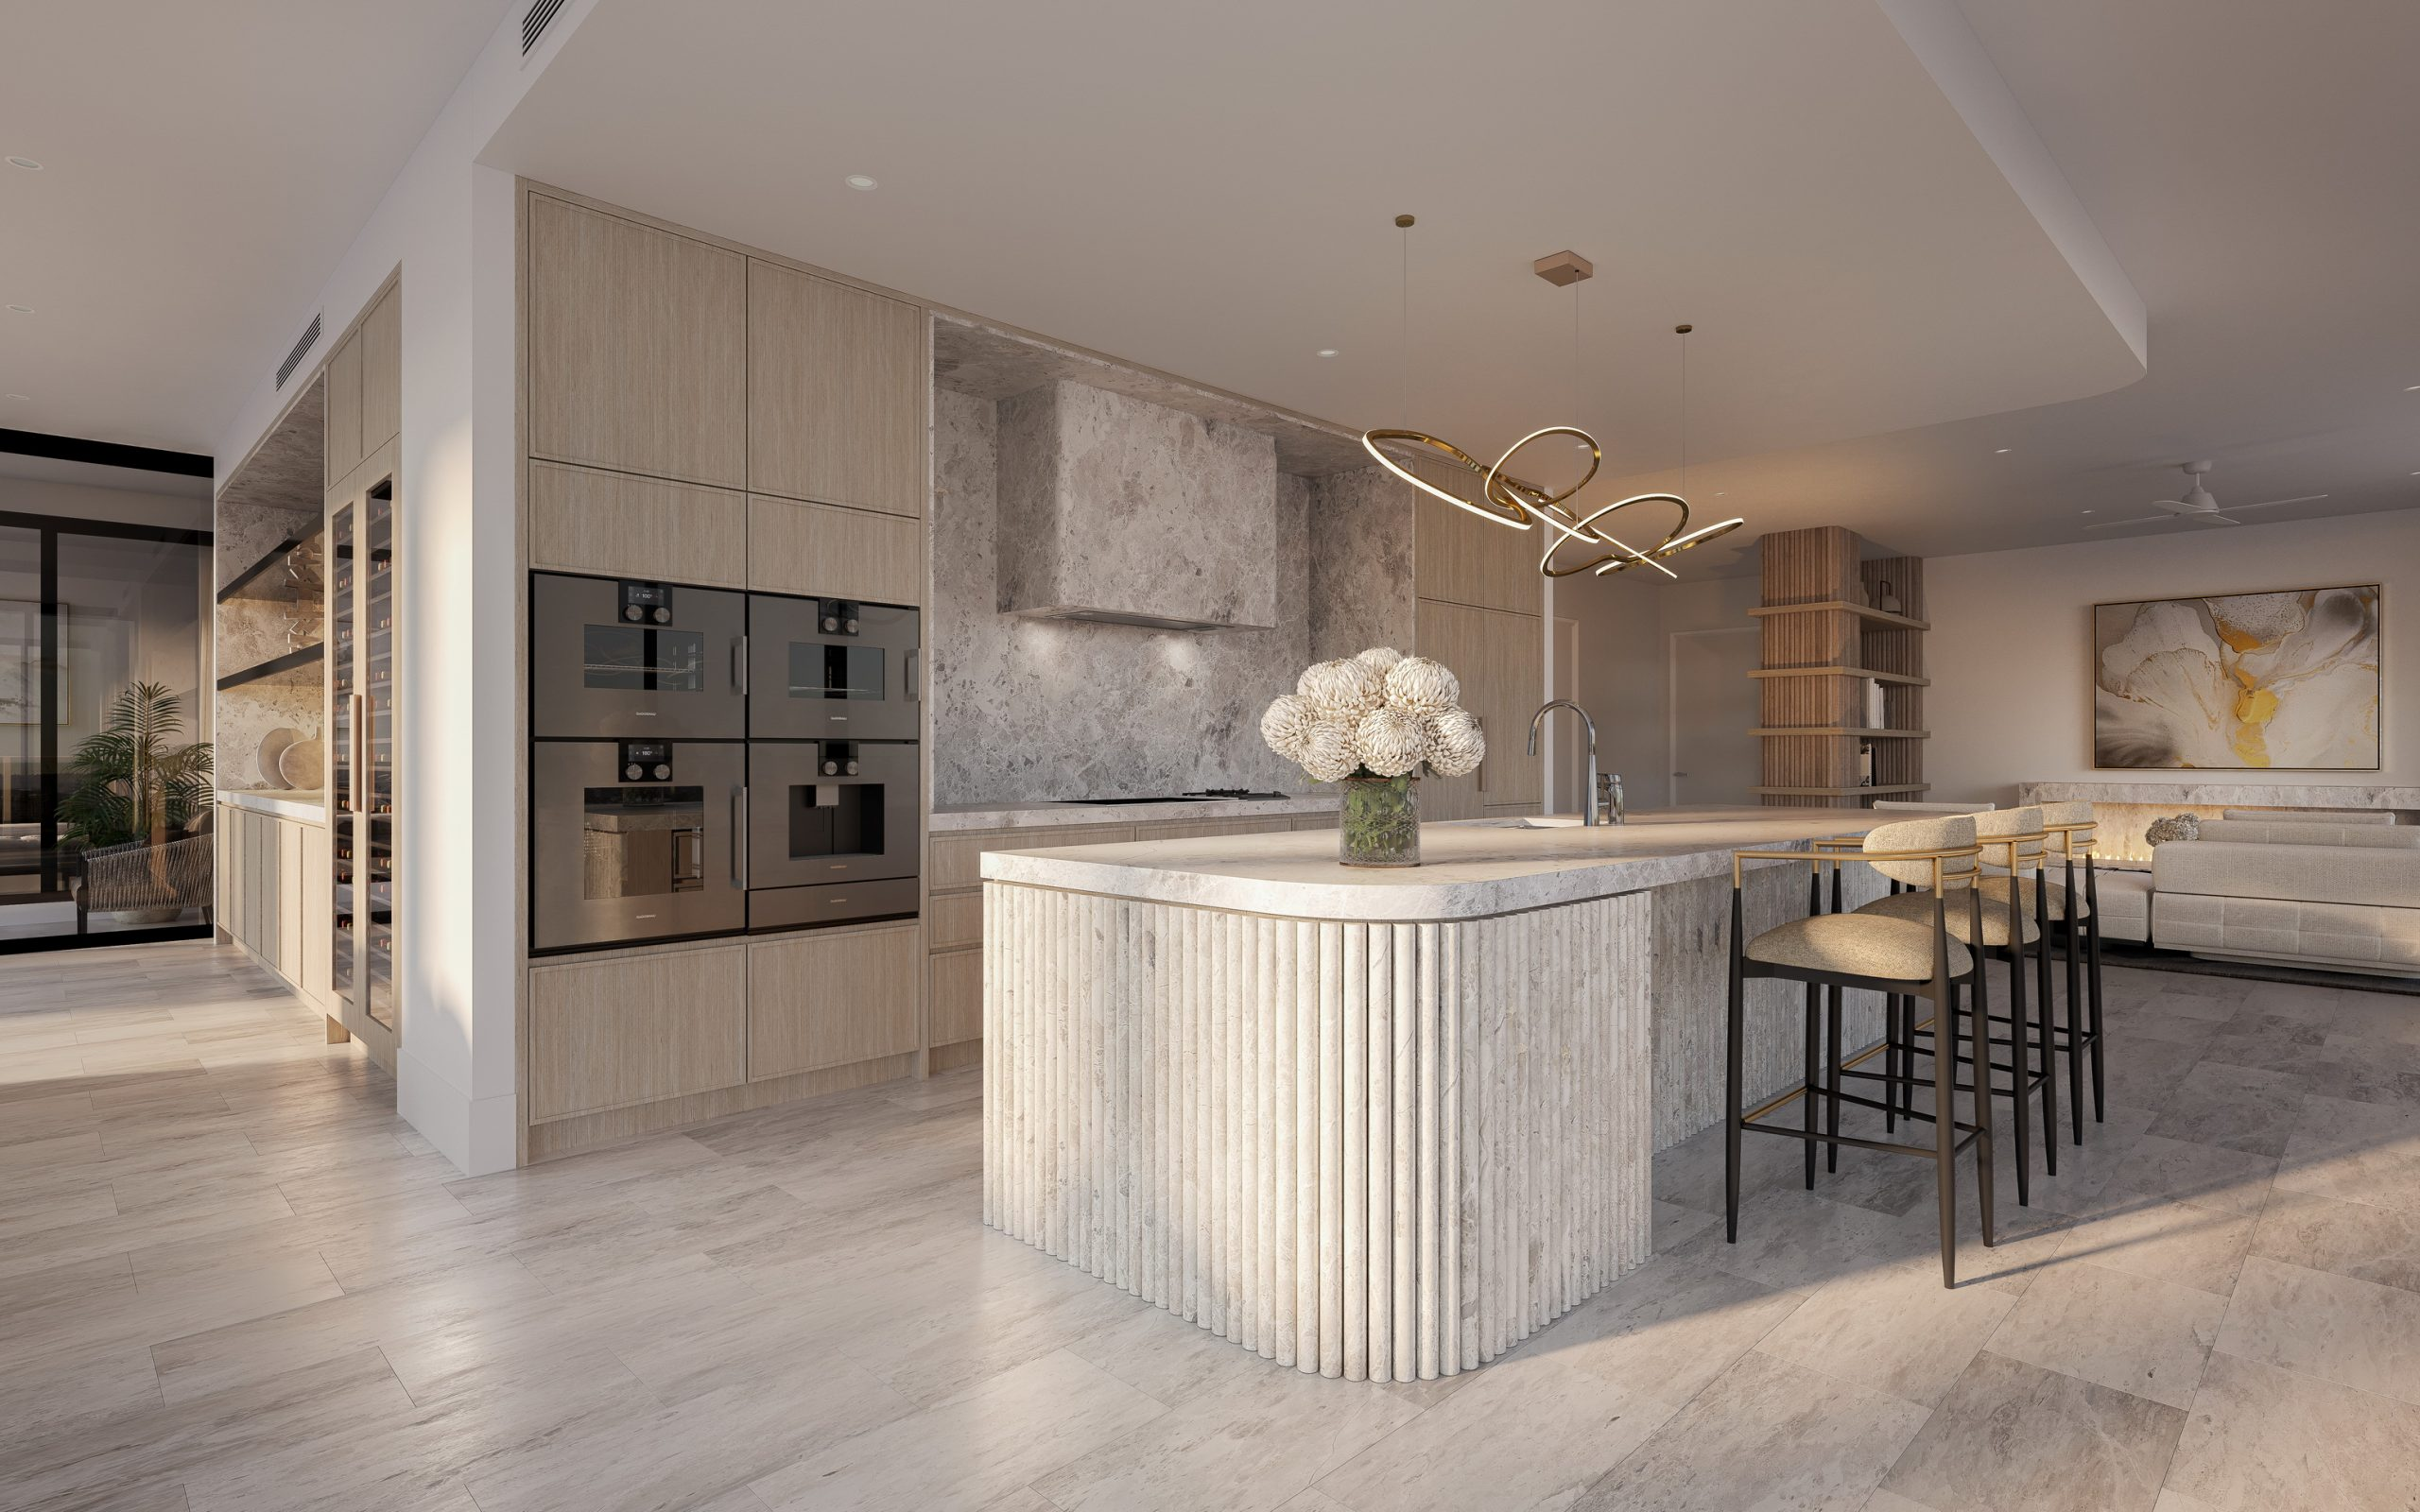 Rivello-queensland-render-3d-fkd-studio-architecture-luxury-interior-design-kitchen-penthouse